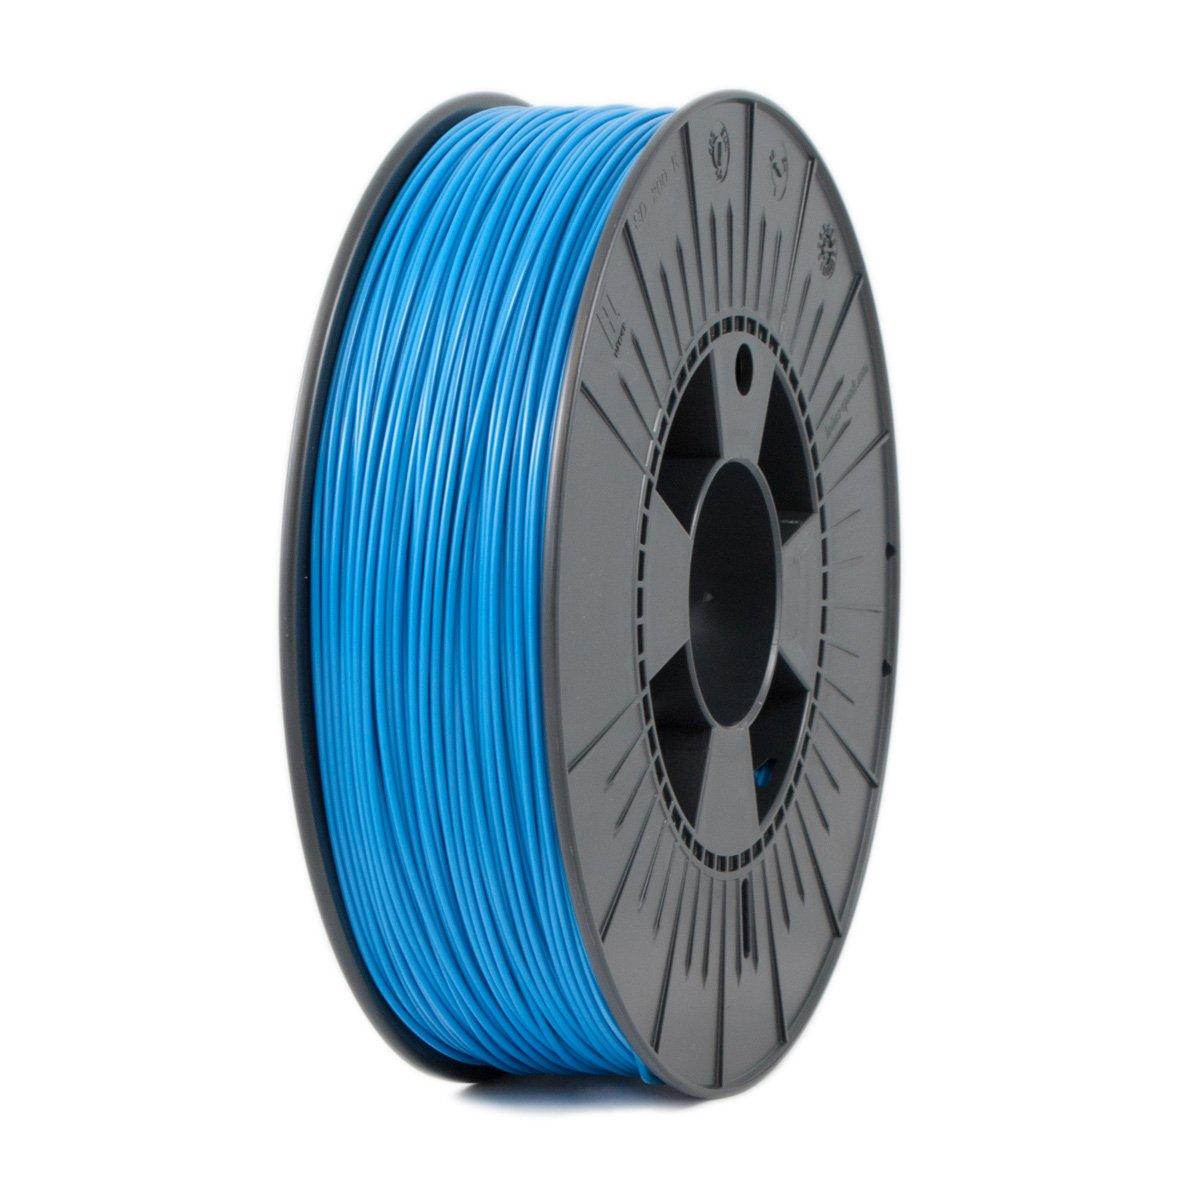 Ice Filaments ICEFIL1PLA007 Filamento PLA, 1,75 mm, 0,75 kg, Azul